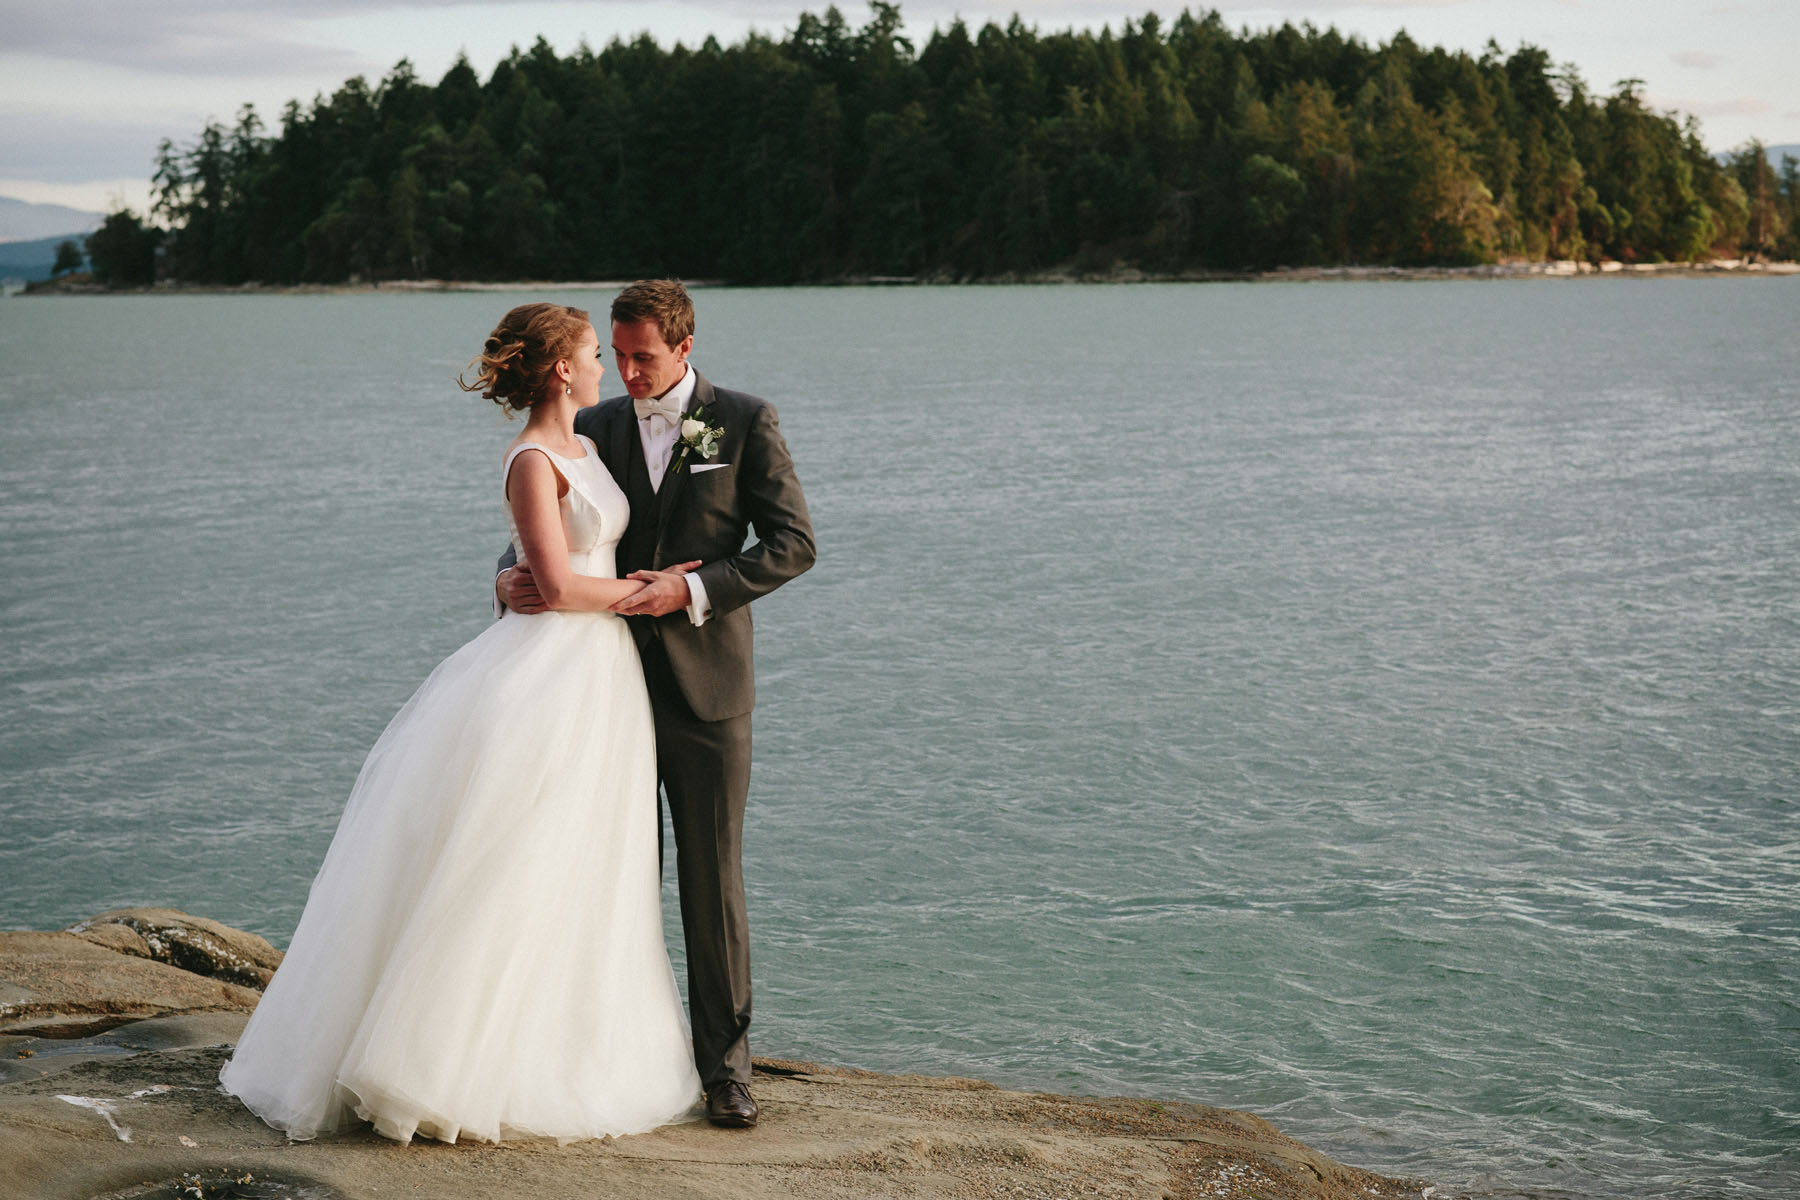 thetis-island-wedding-photographer-rp-rn-138.jpg